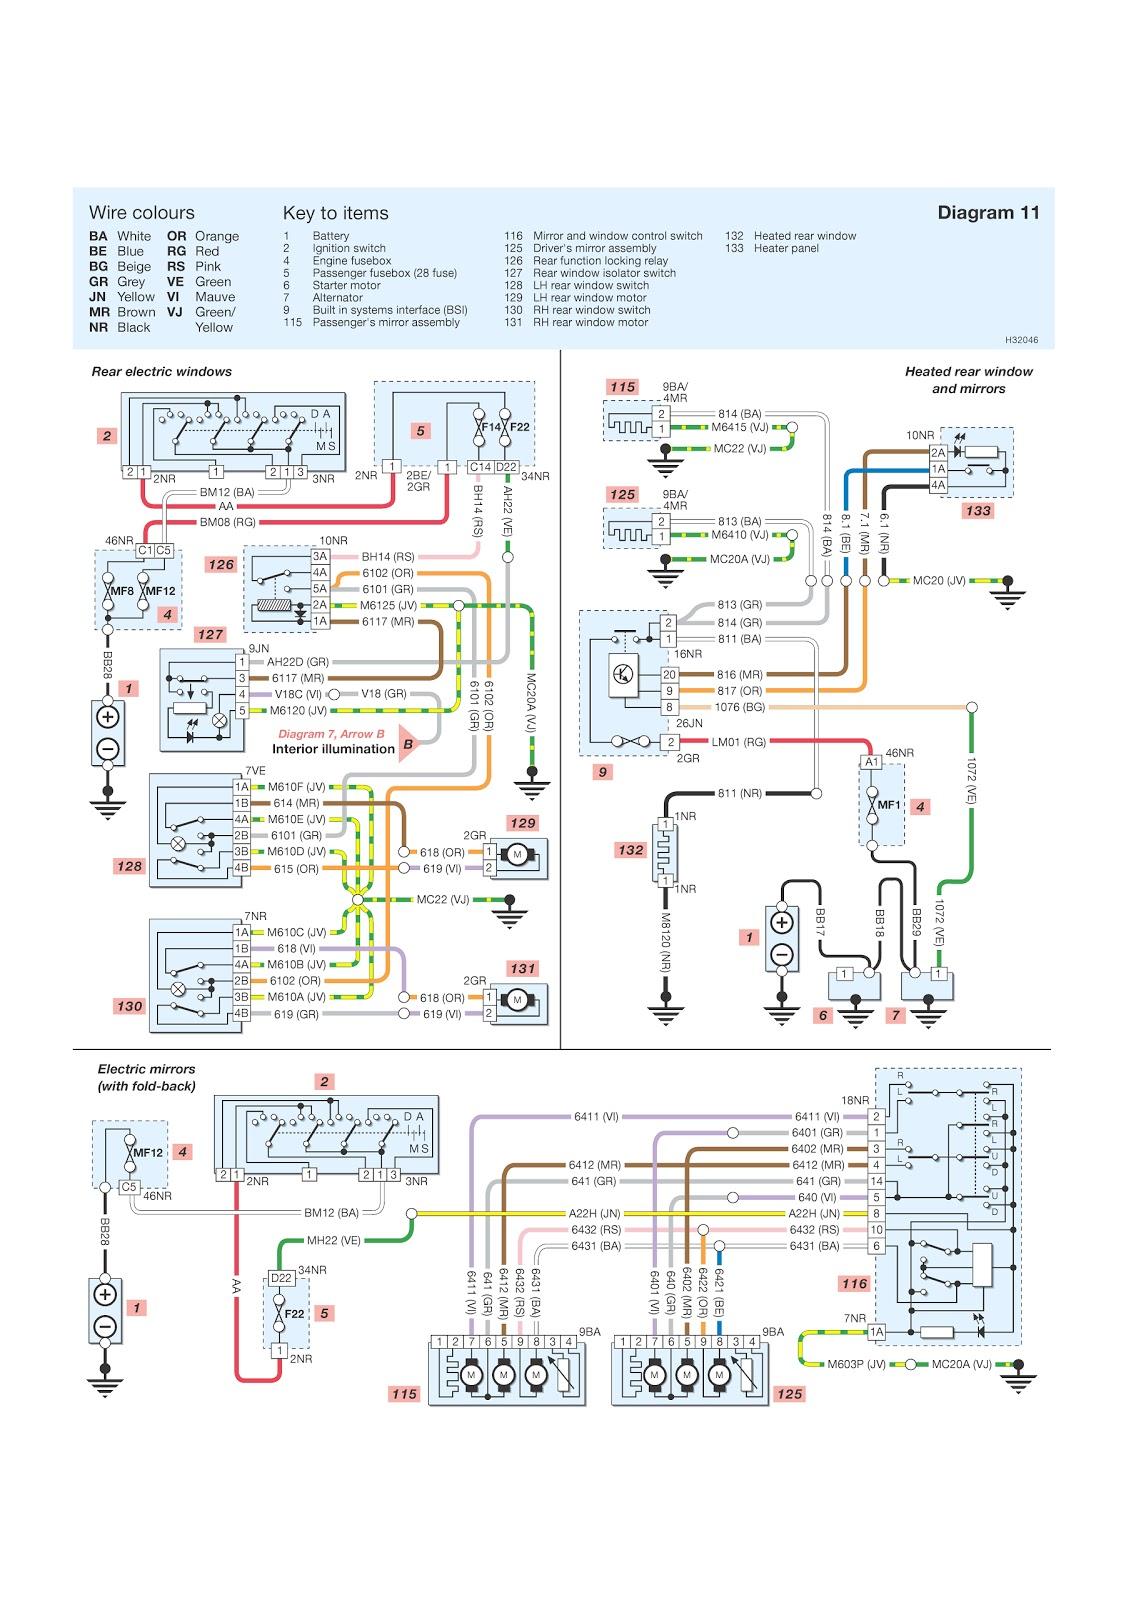 [DIAGRAM_1JK]  AY_0152] Peugeot 206 Wiring Diagrams Central Locking Schematic Wiring  Wiring Diagram | 206 Central Locking Wiring Diagram |  | Unec Hylec Sequ Piot Rect Mohammedshrine Librar Wiring 101